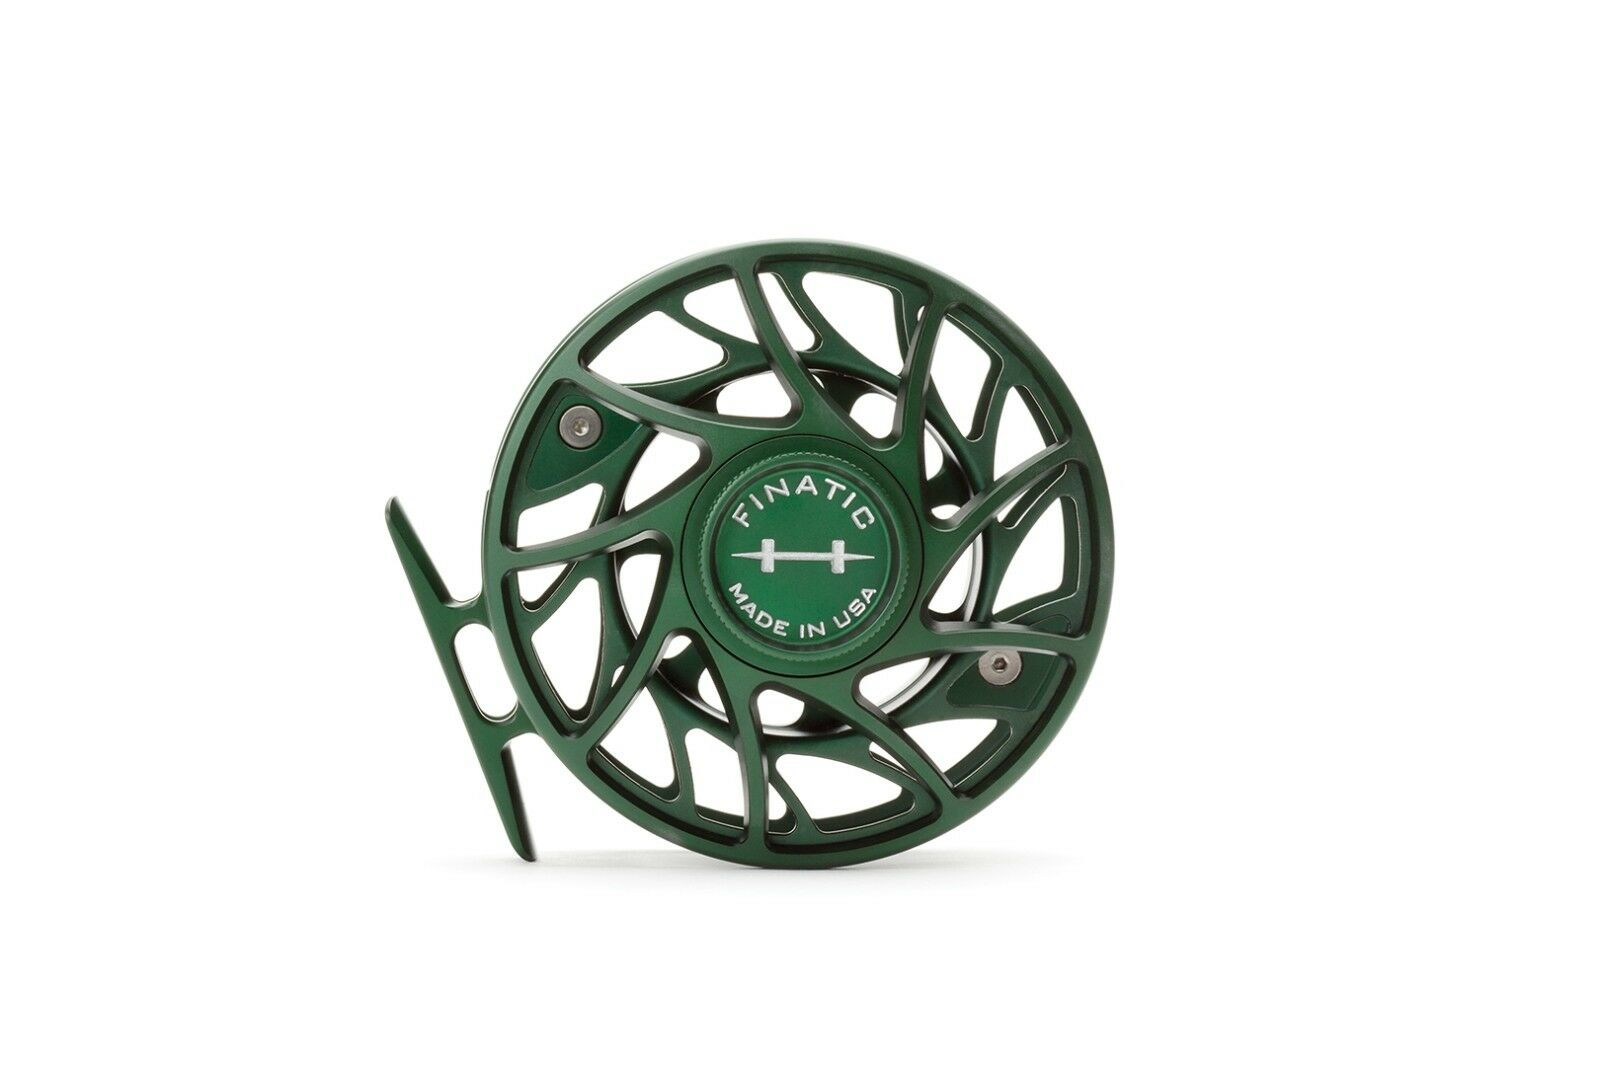 Hatch Green Finatic 9 Plus Gen 2 Fly Reel Large Arbor - Streams of Dreams Fly